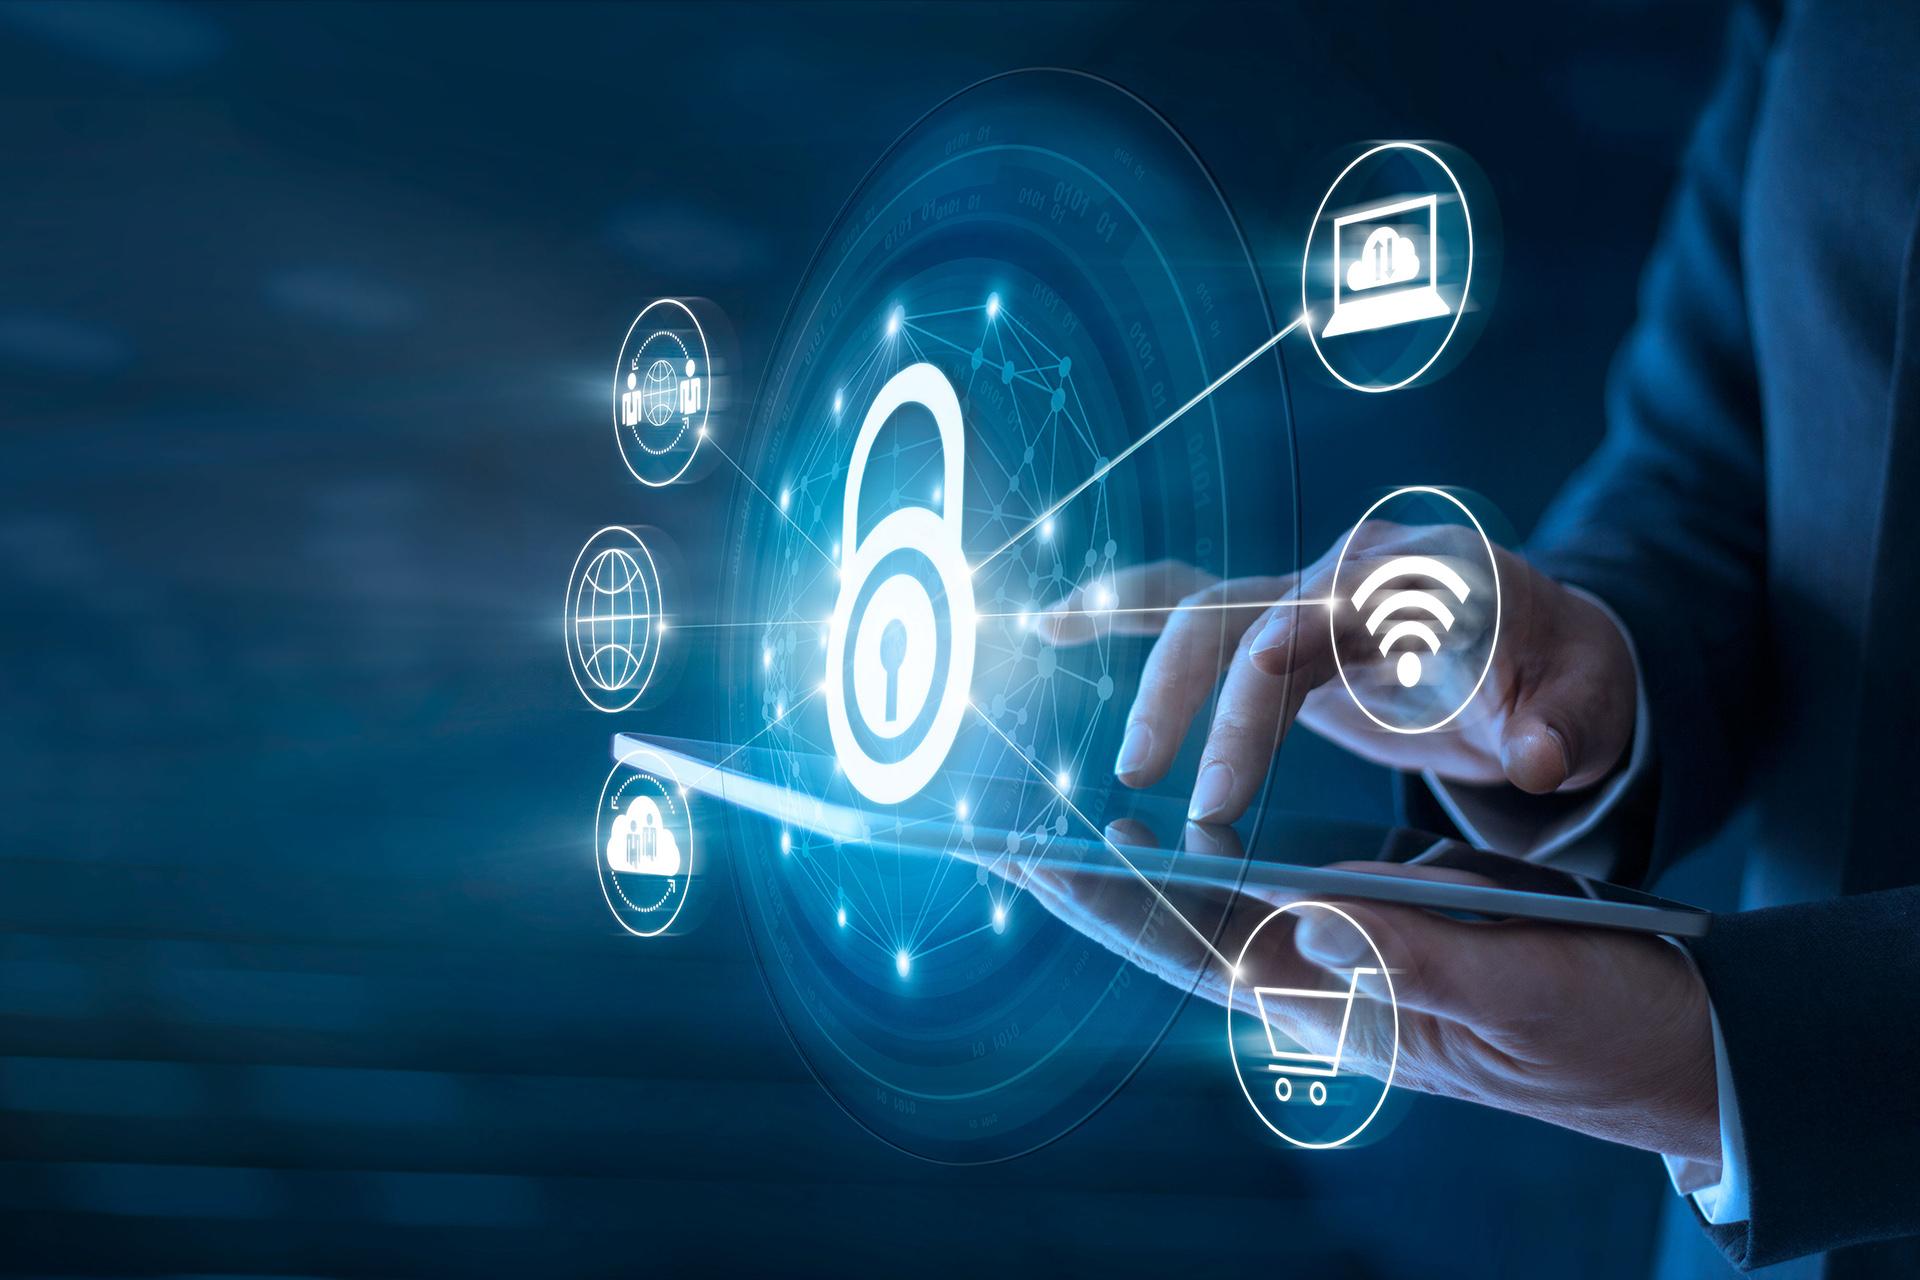 Generic image symbolizing cybersecurity